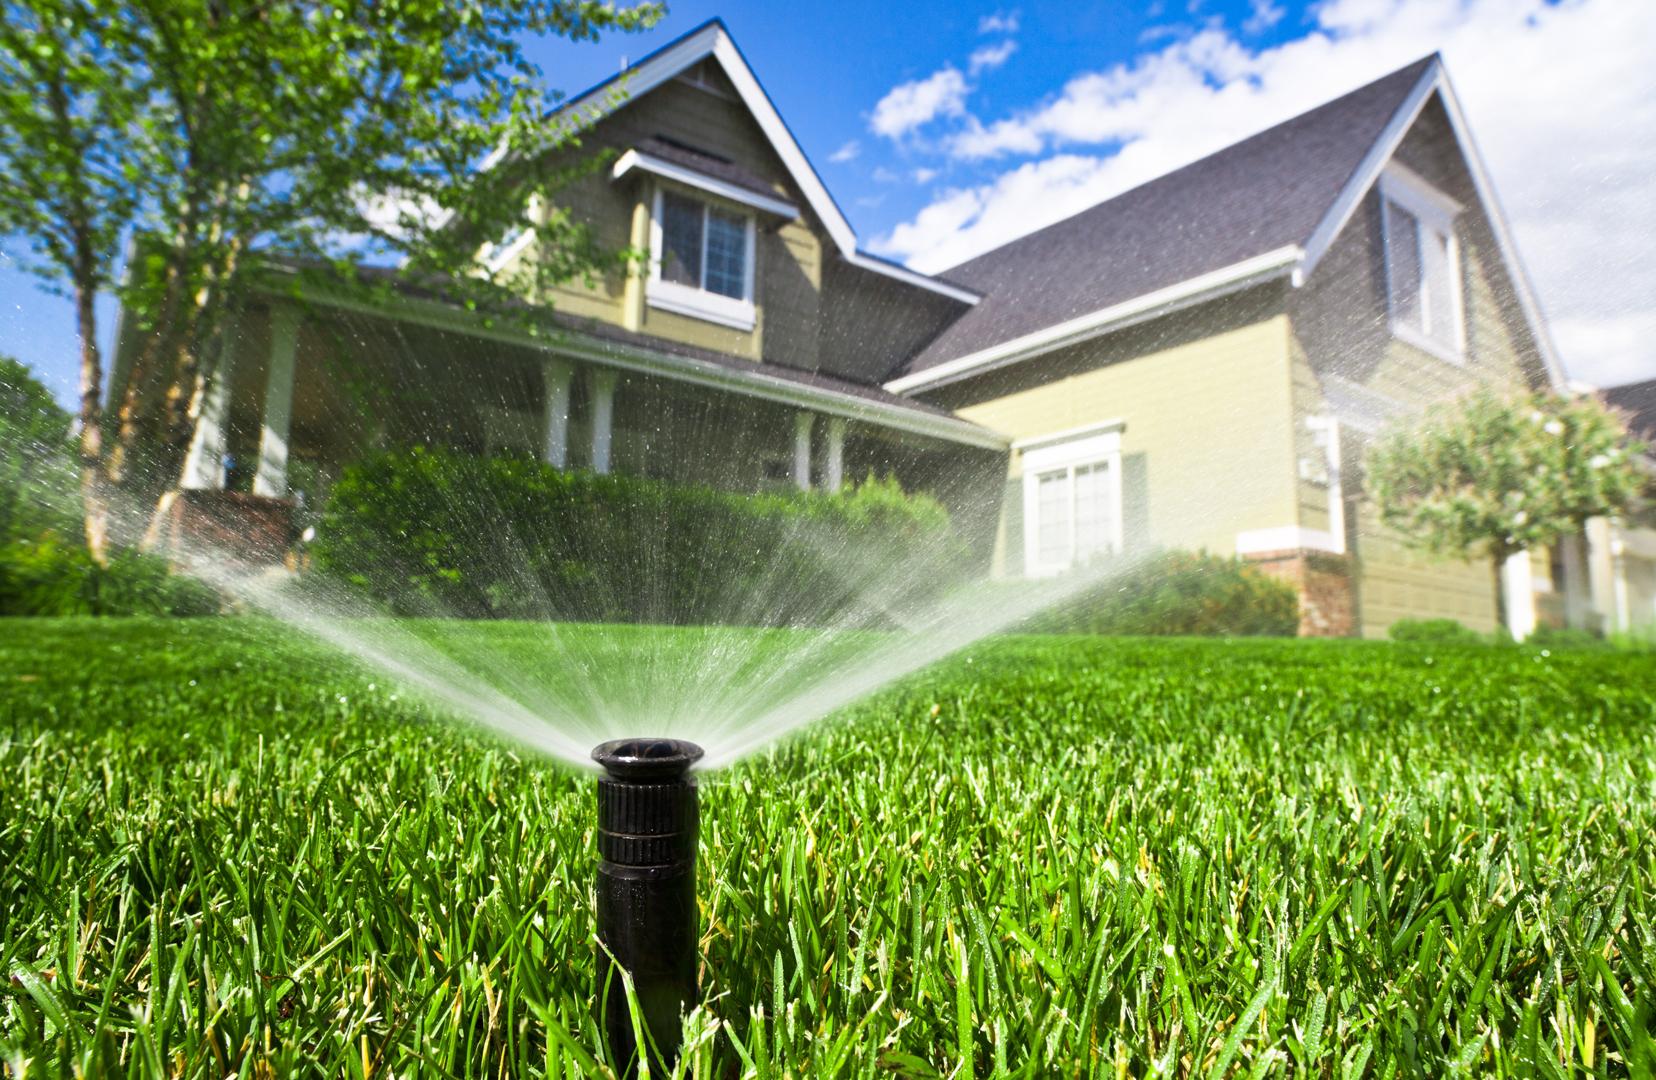 Sprinkler System Installation Wichita